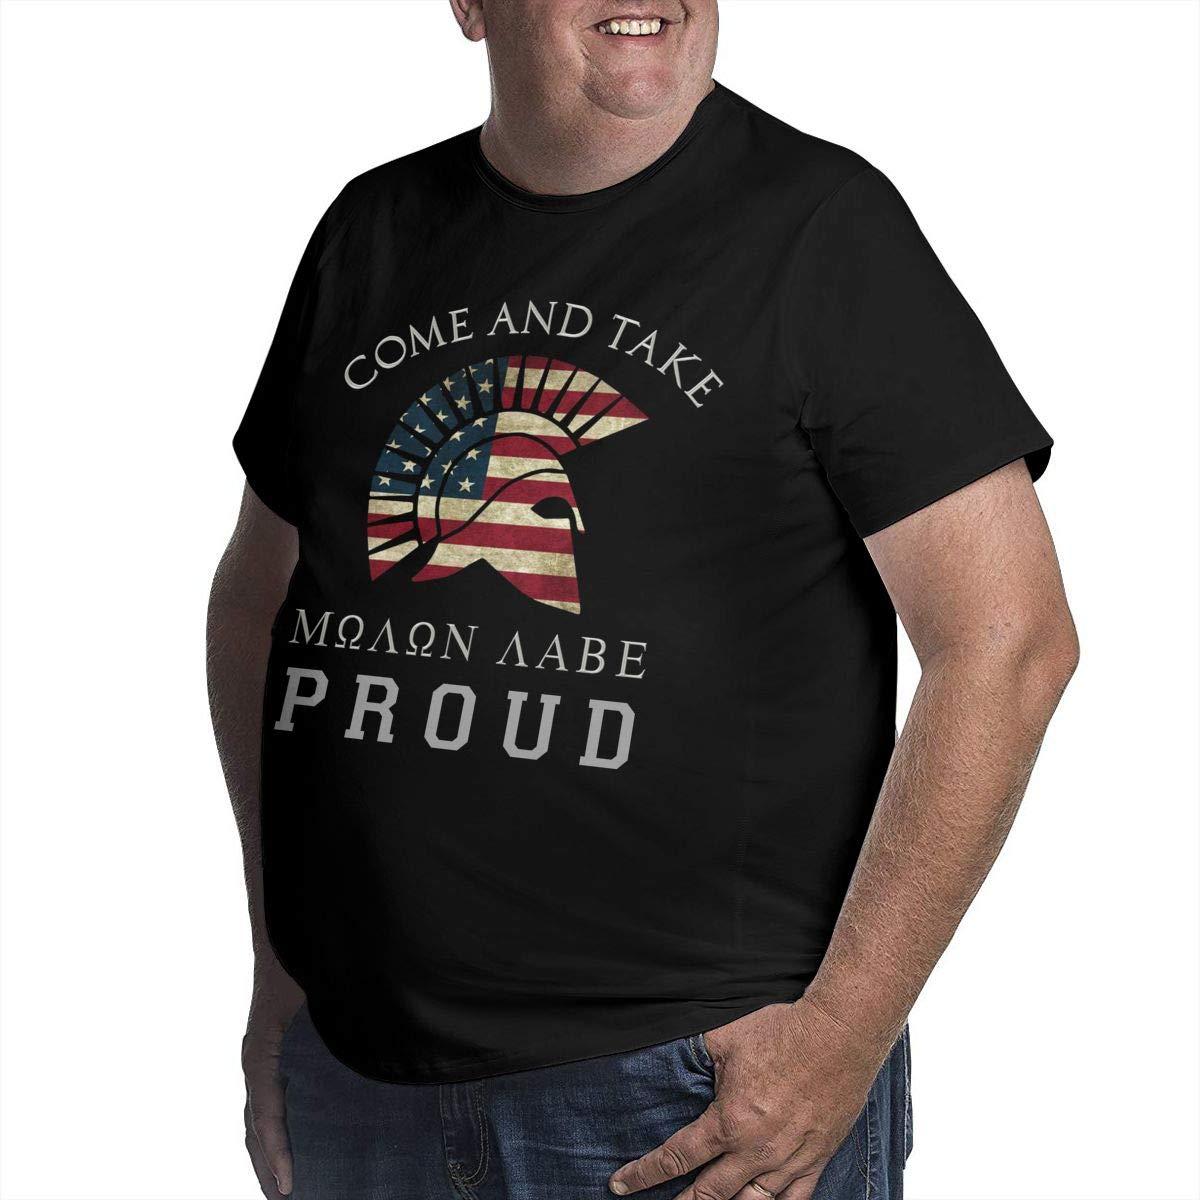 YONGCHOO JR Molon Labe Come and Take American Proud Mens Short Sleeve T-Shirt Big /& Tall Heavyweight T-Shirt